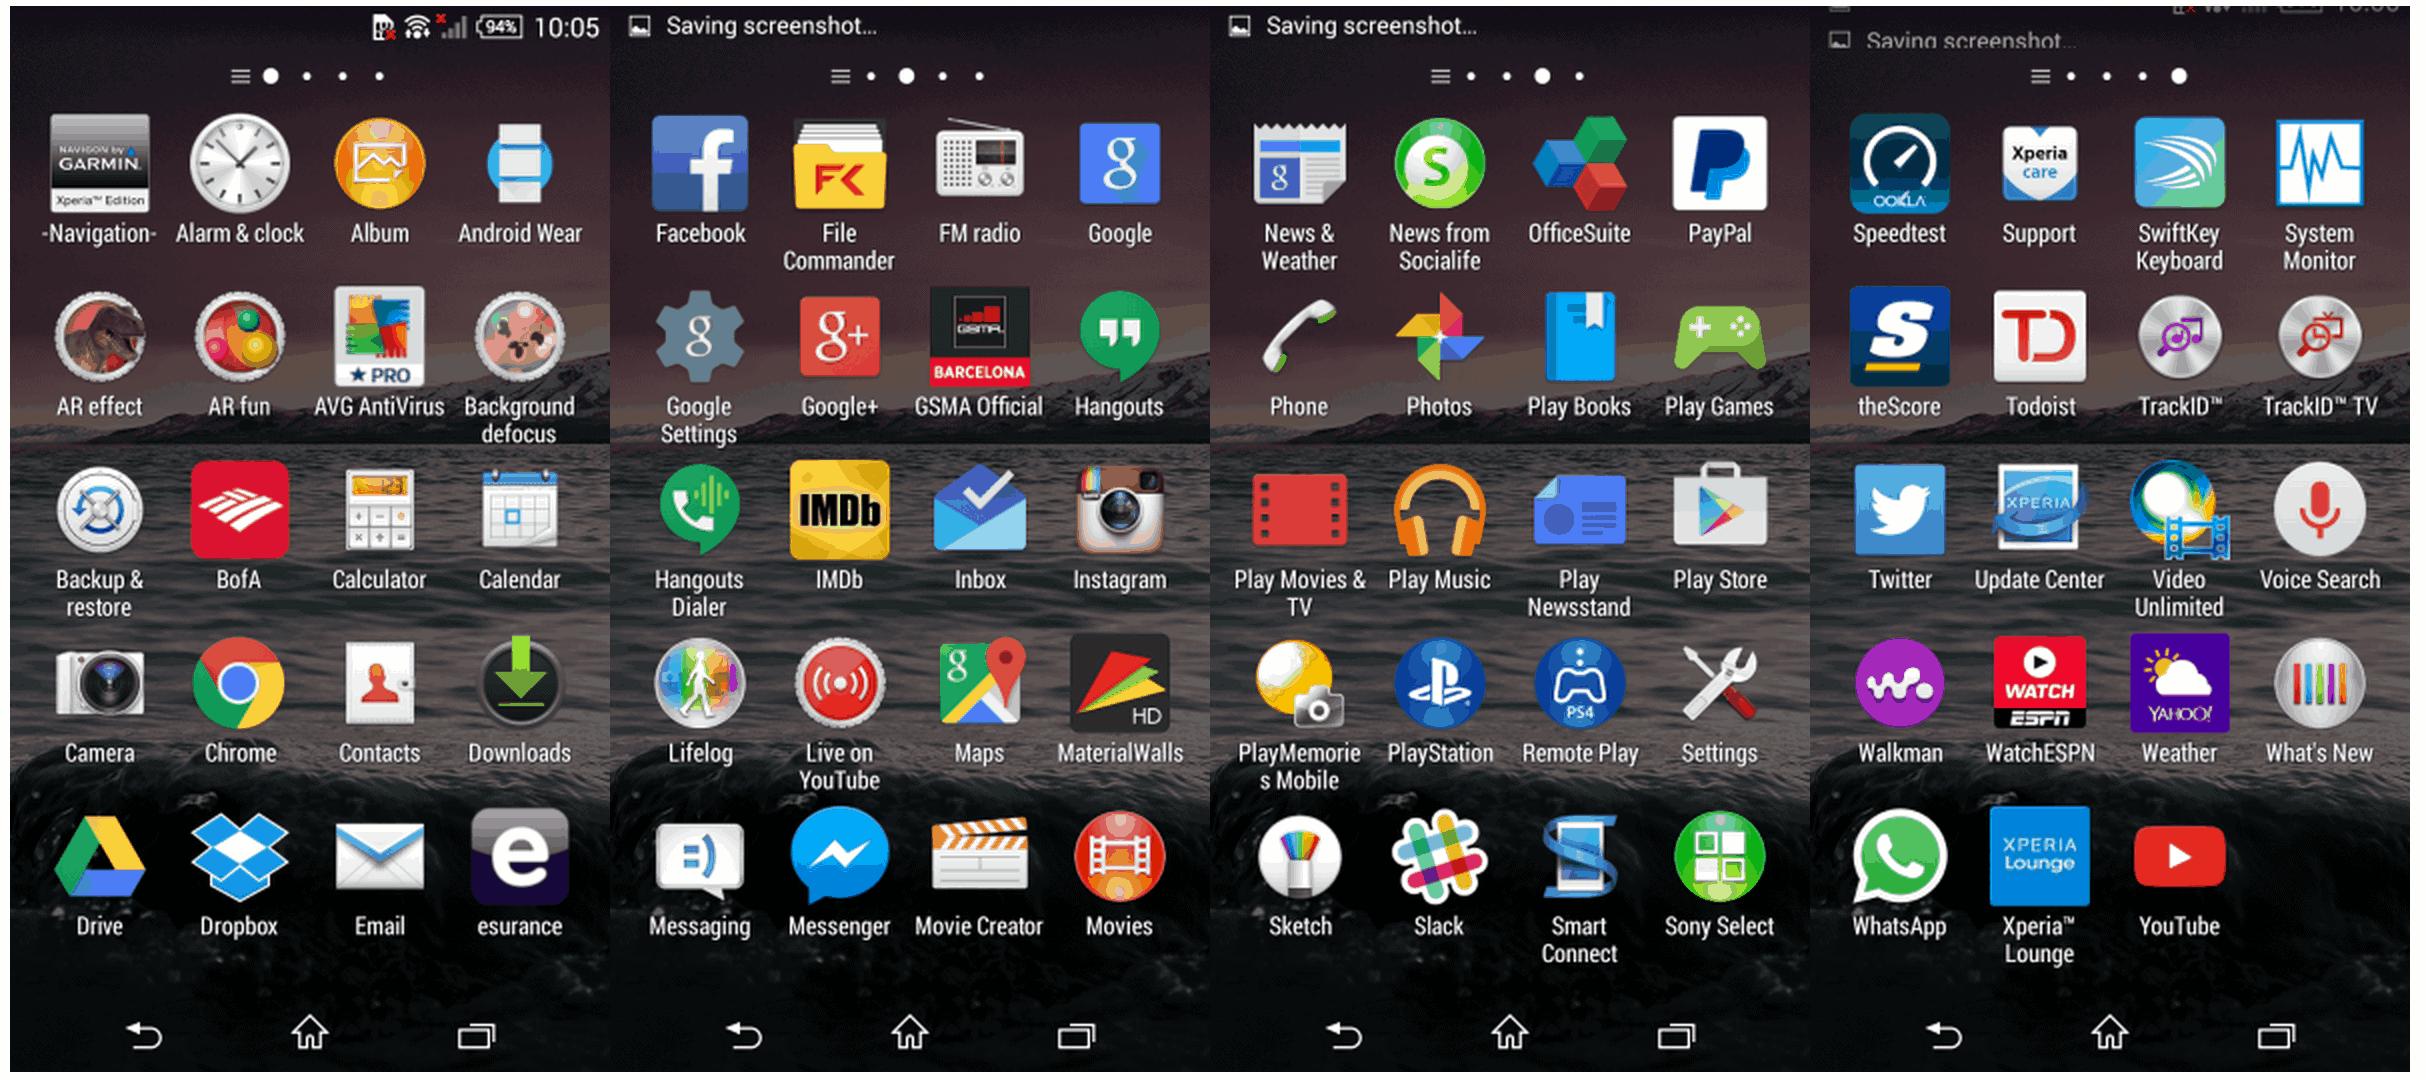 Screenshot 2015-02-14 22.16.16